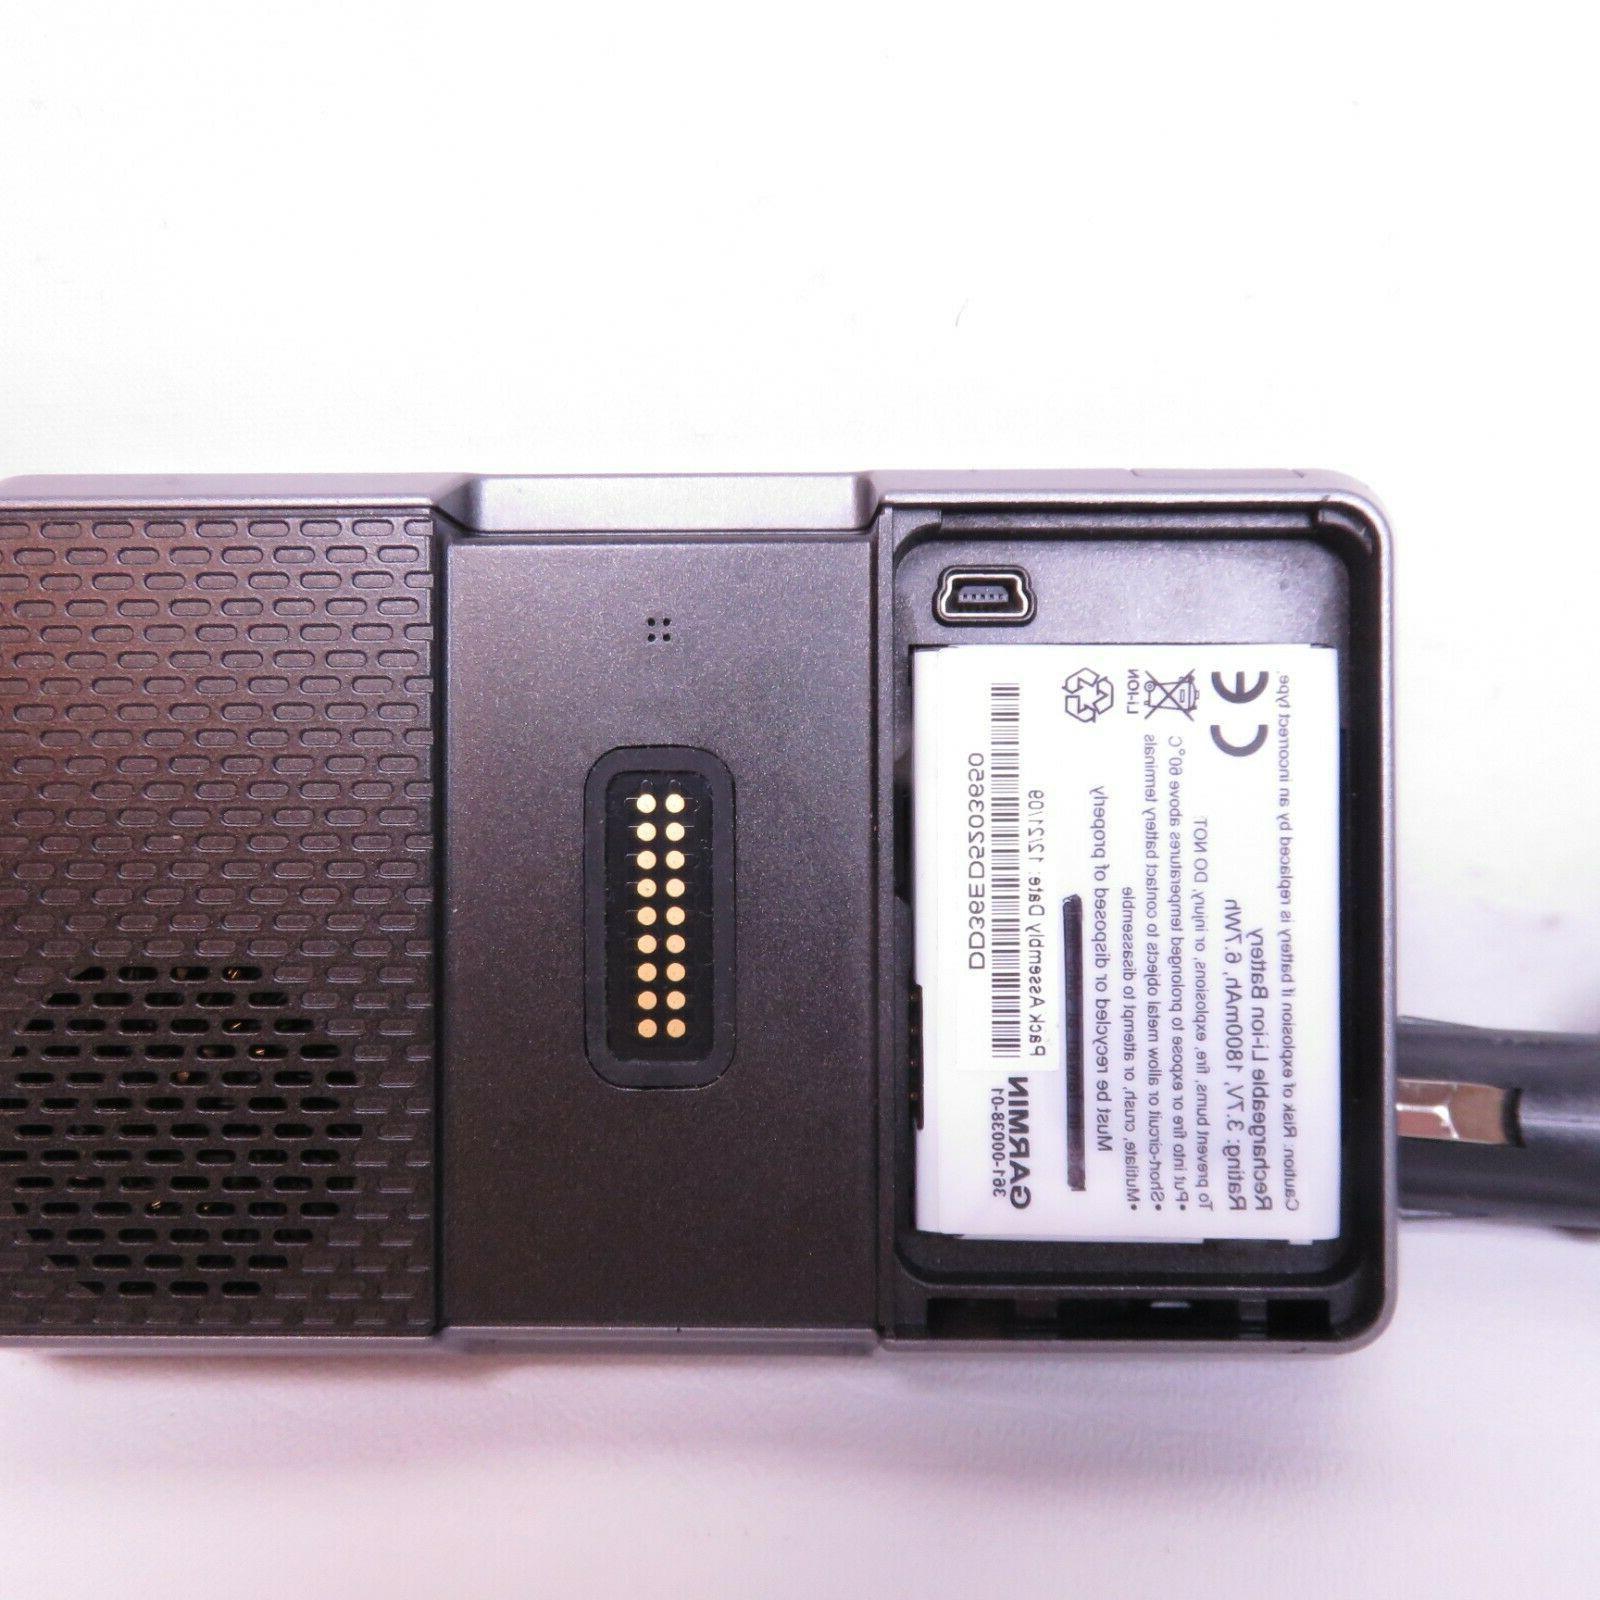 Garmin 665 GPS Unit Power Tested